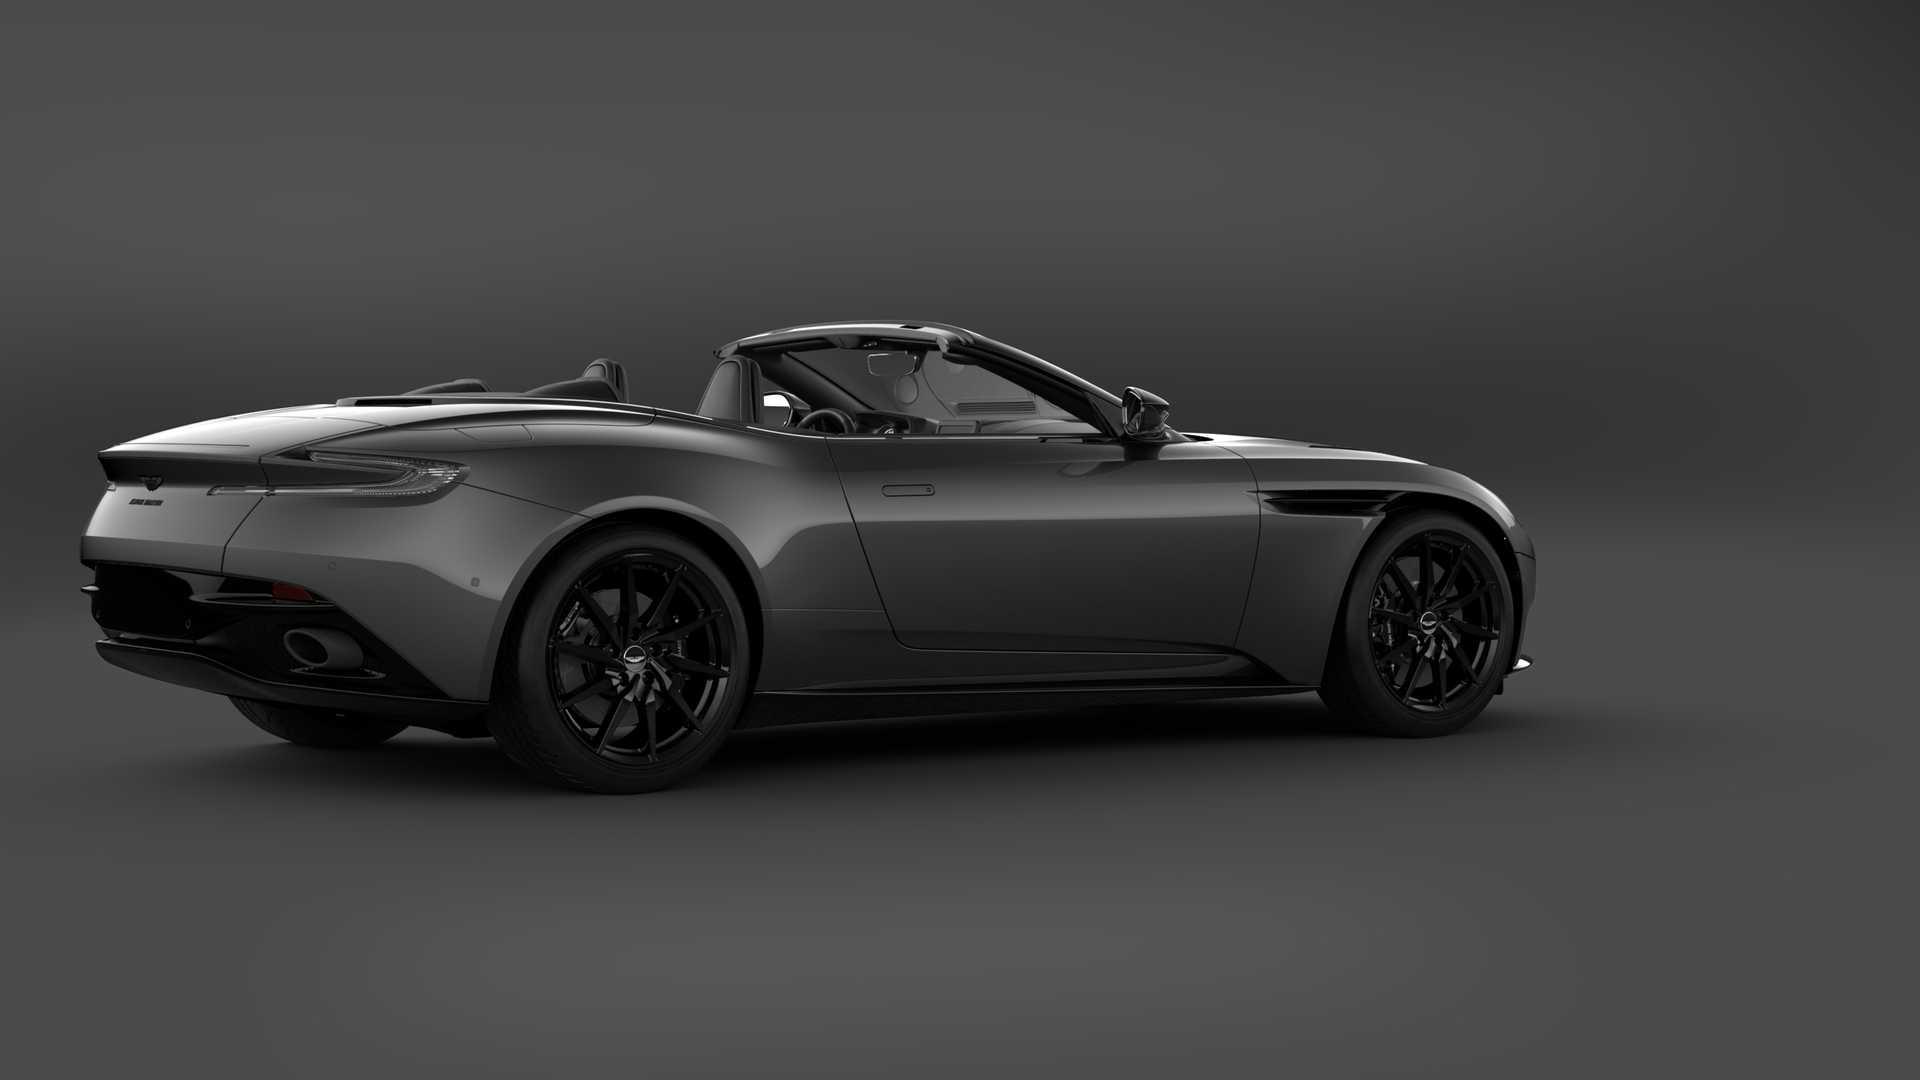 Aston-Martin-DB11-V8-Shadow-Edition-6